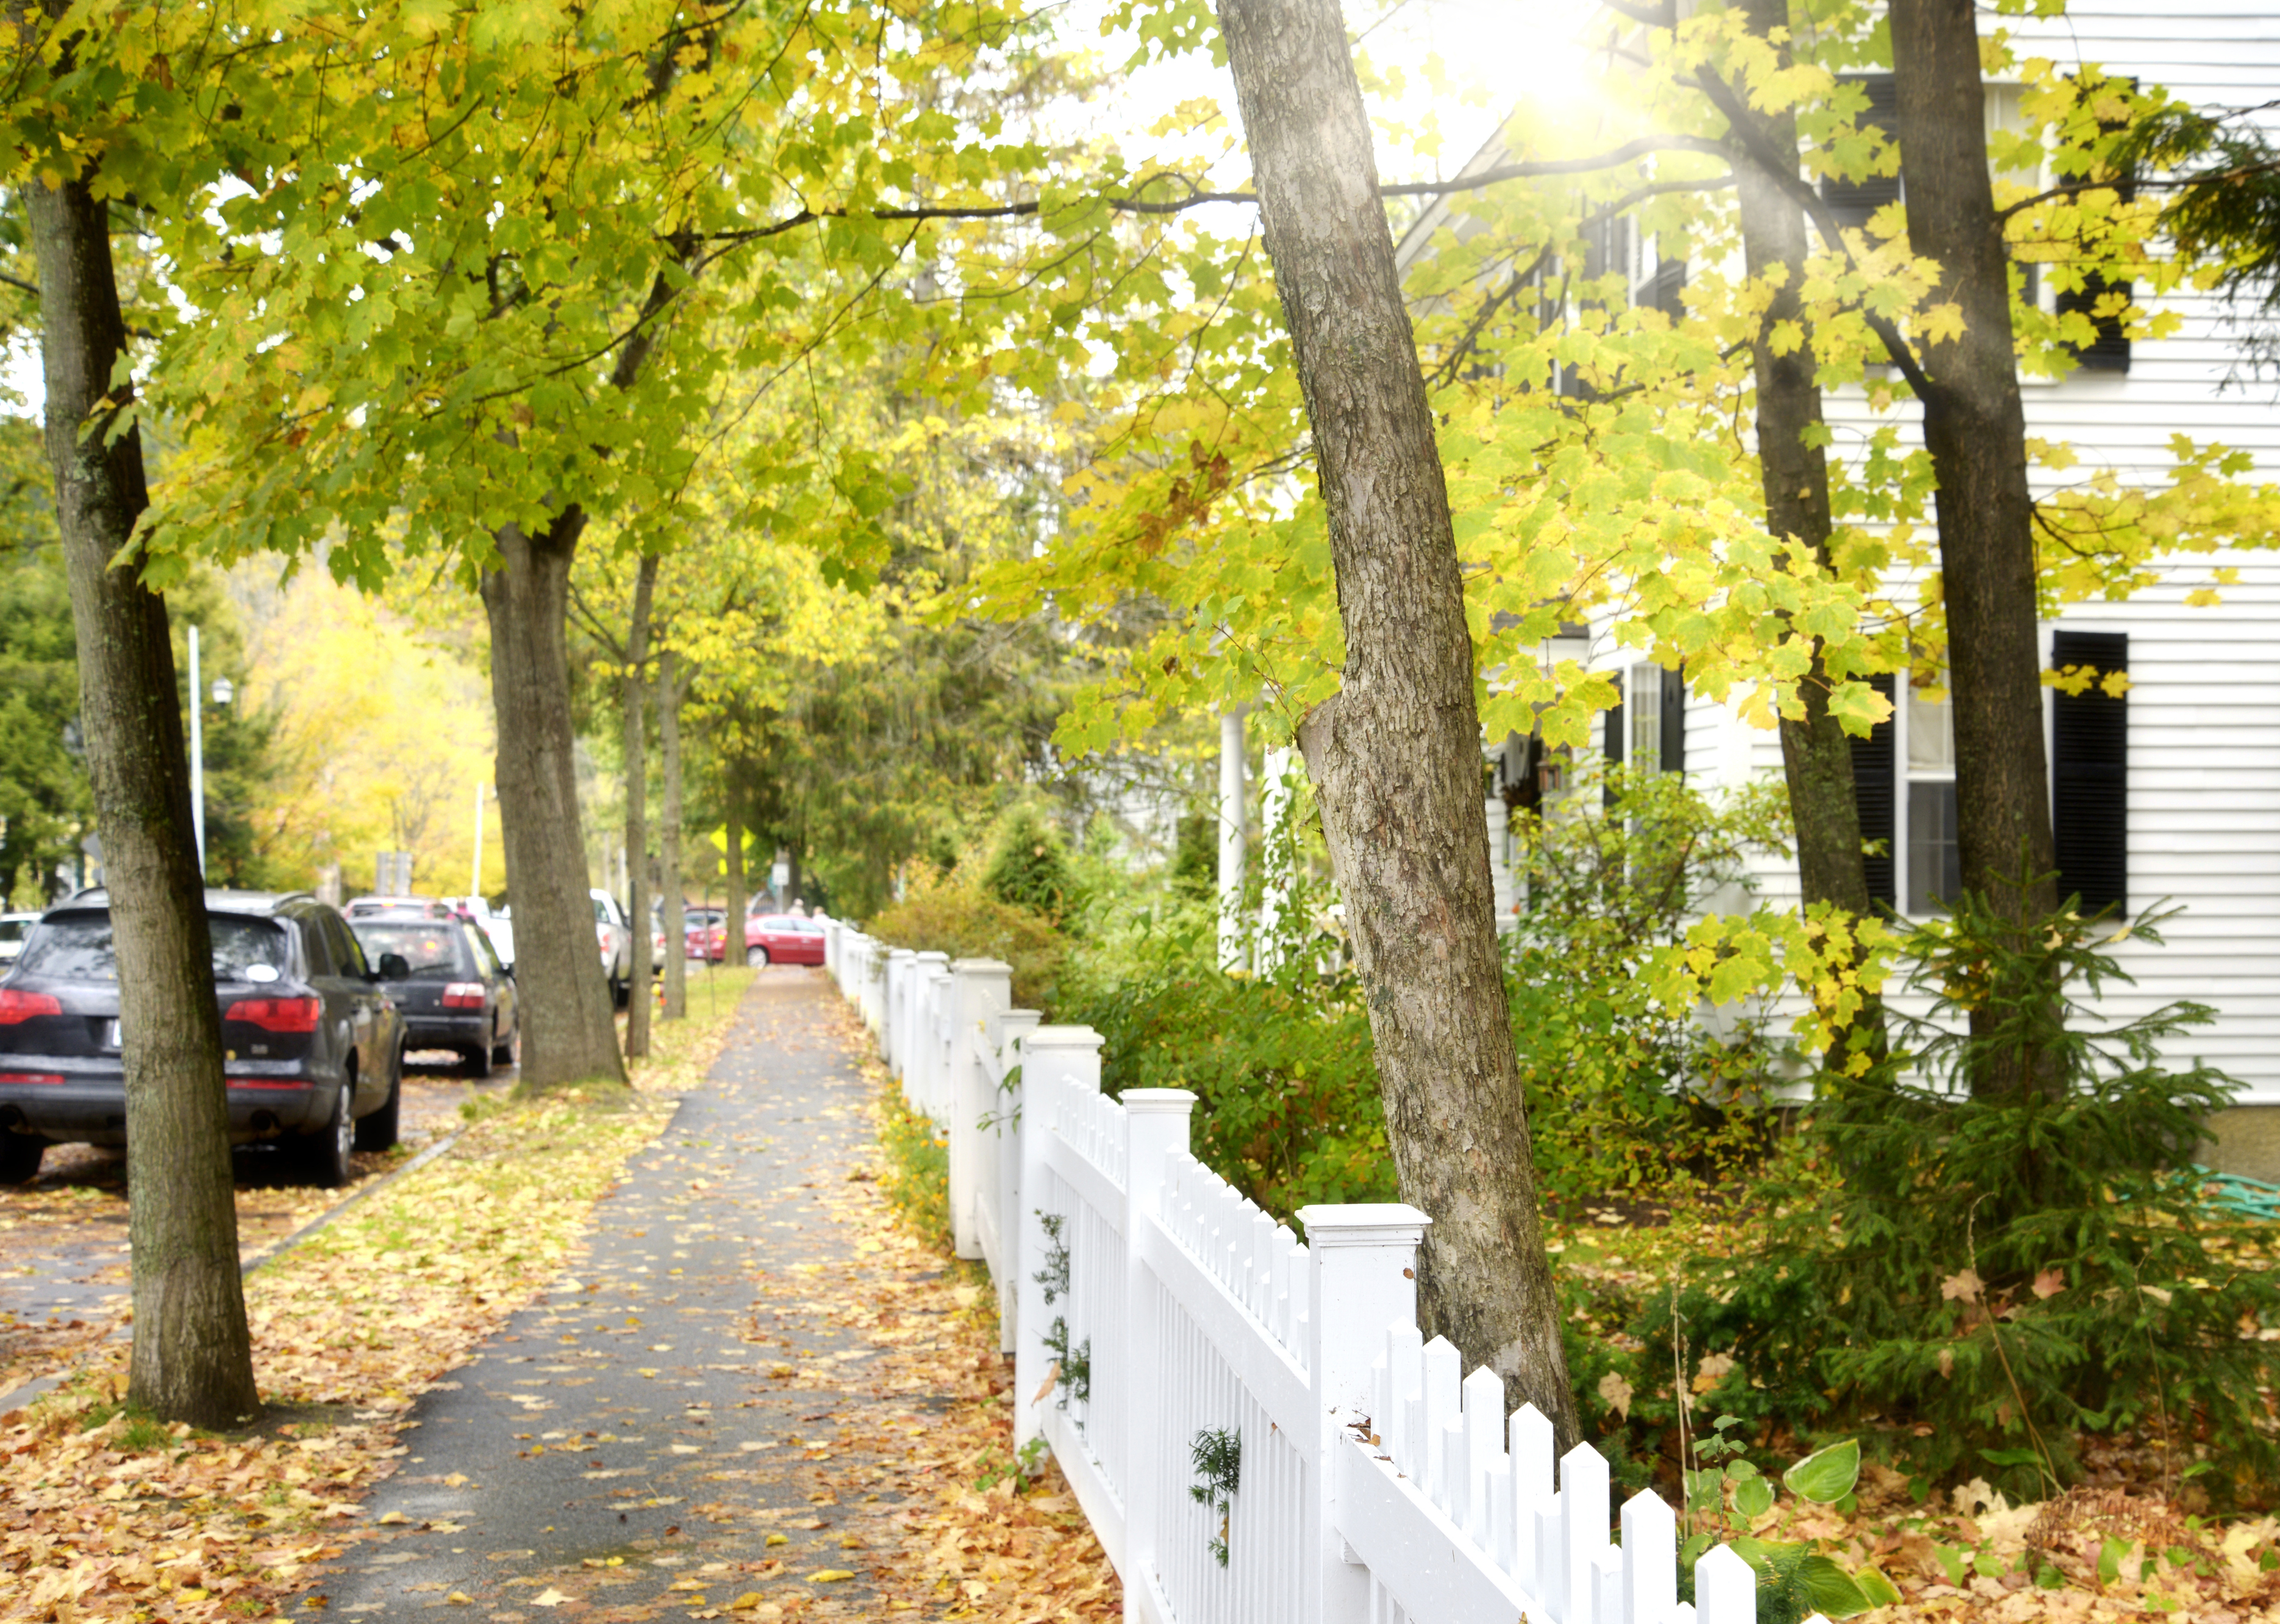 Woodstock VT - tree lined street